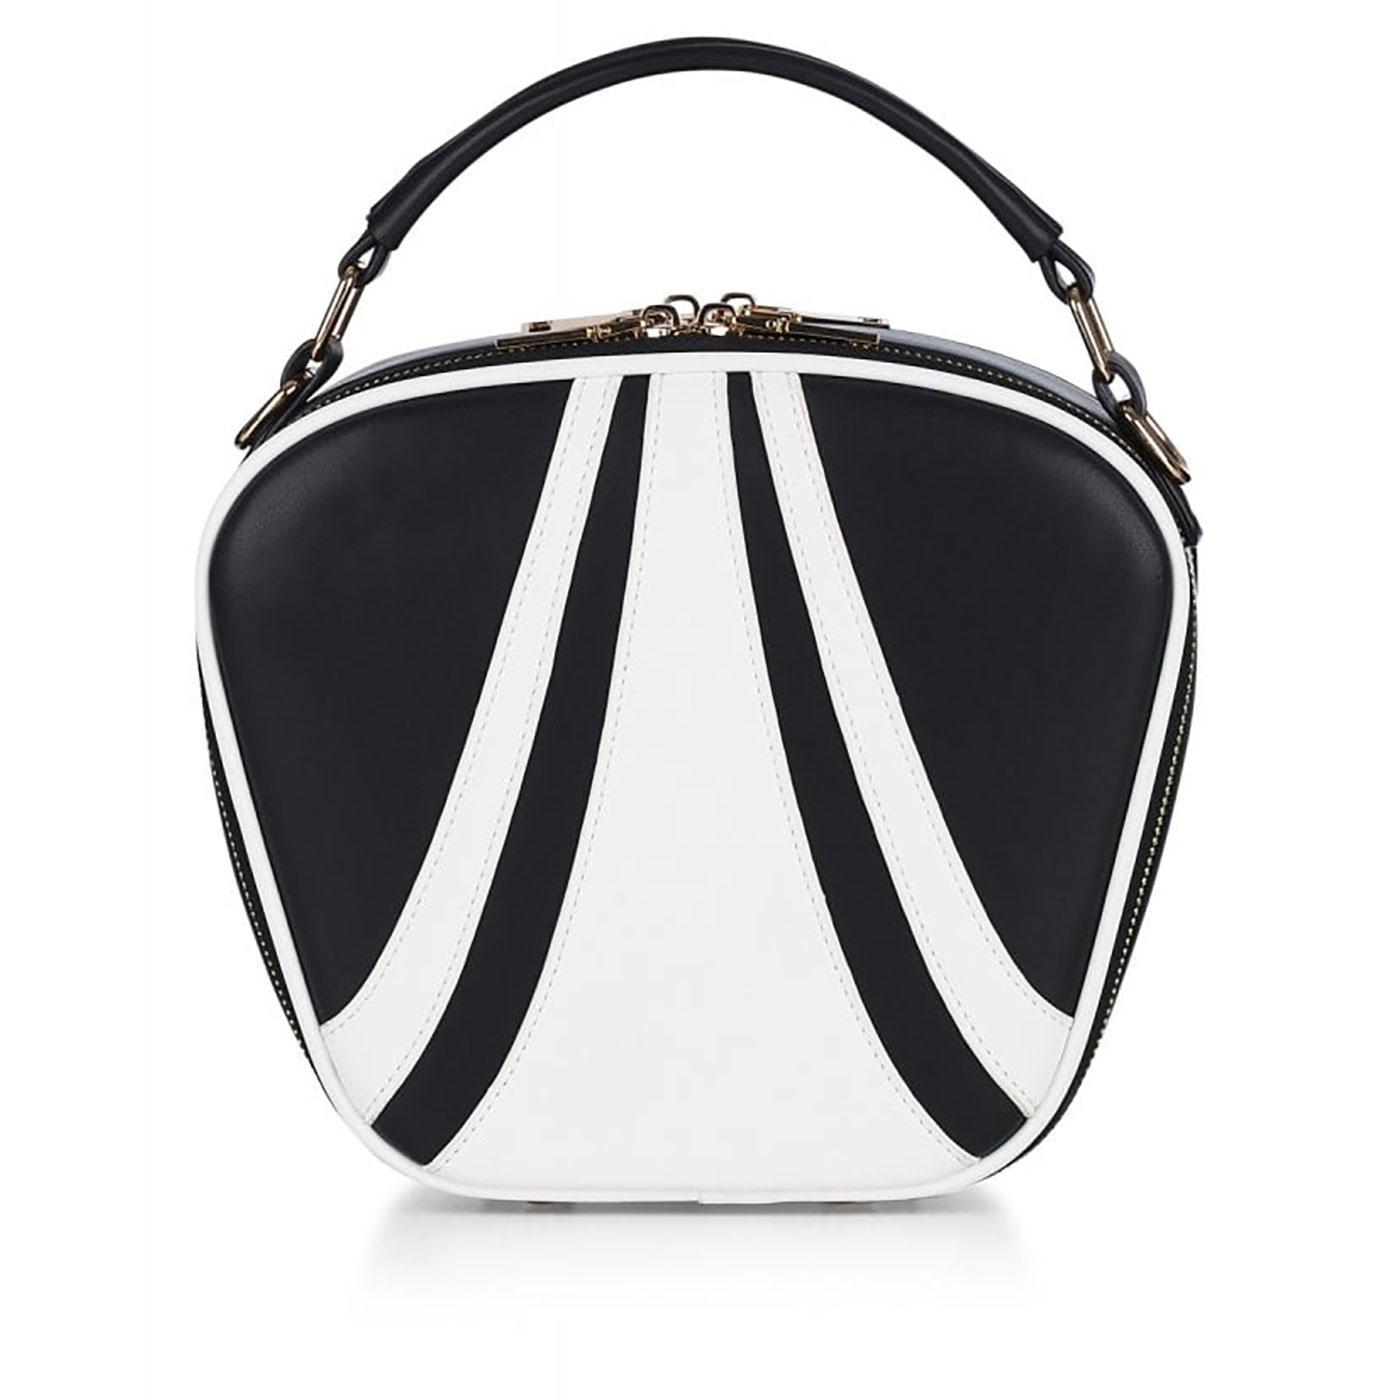 Jeanie LULU HUN Retro 50s style Mod Bowling Bag